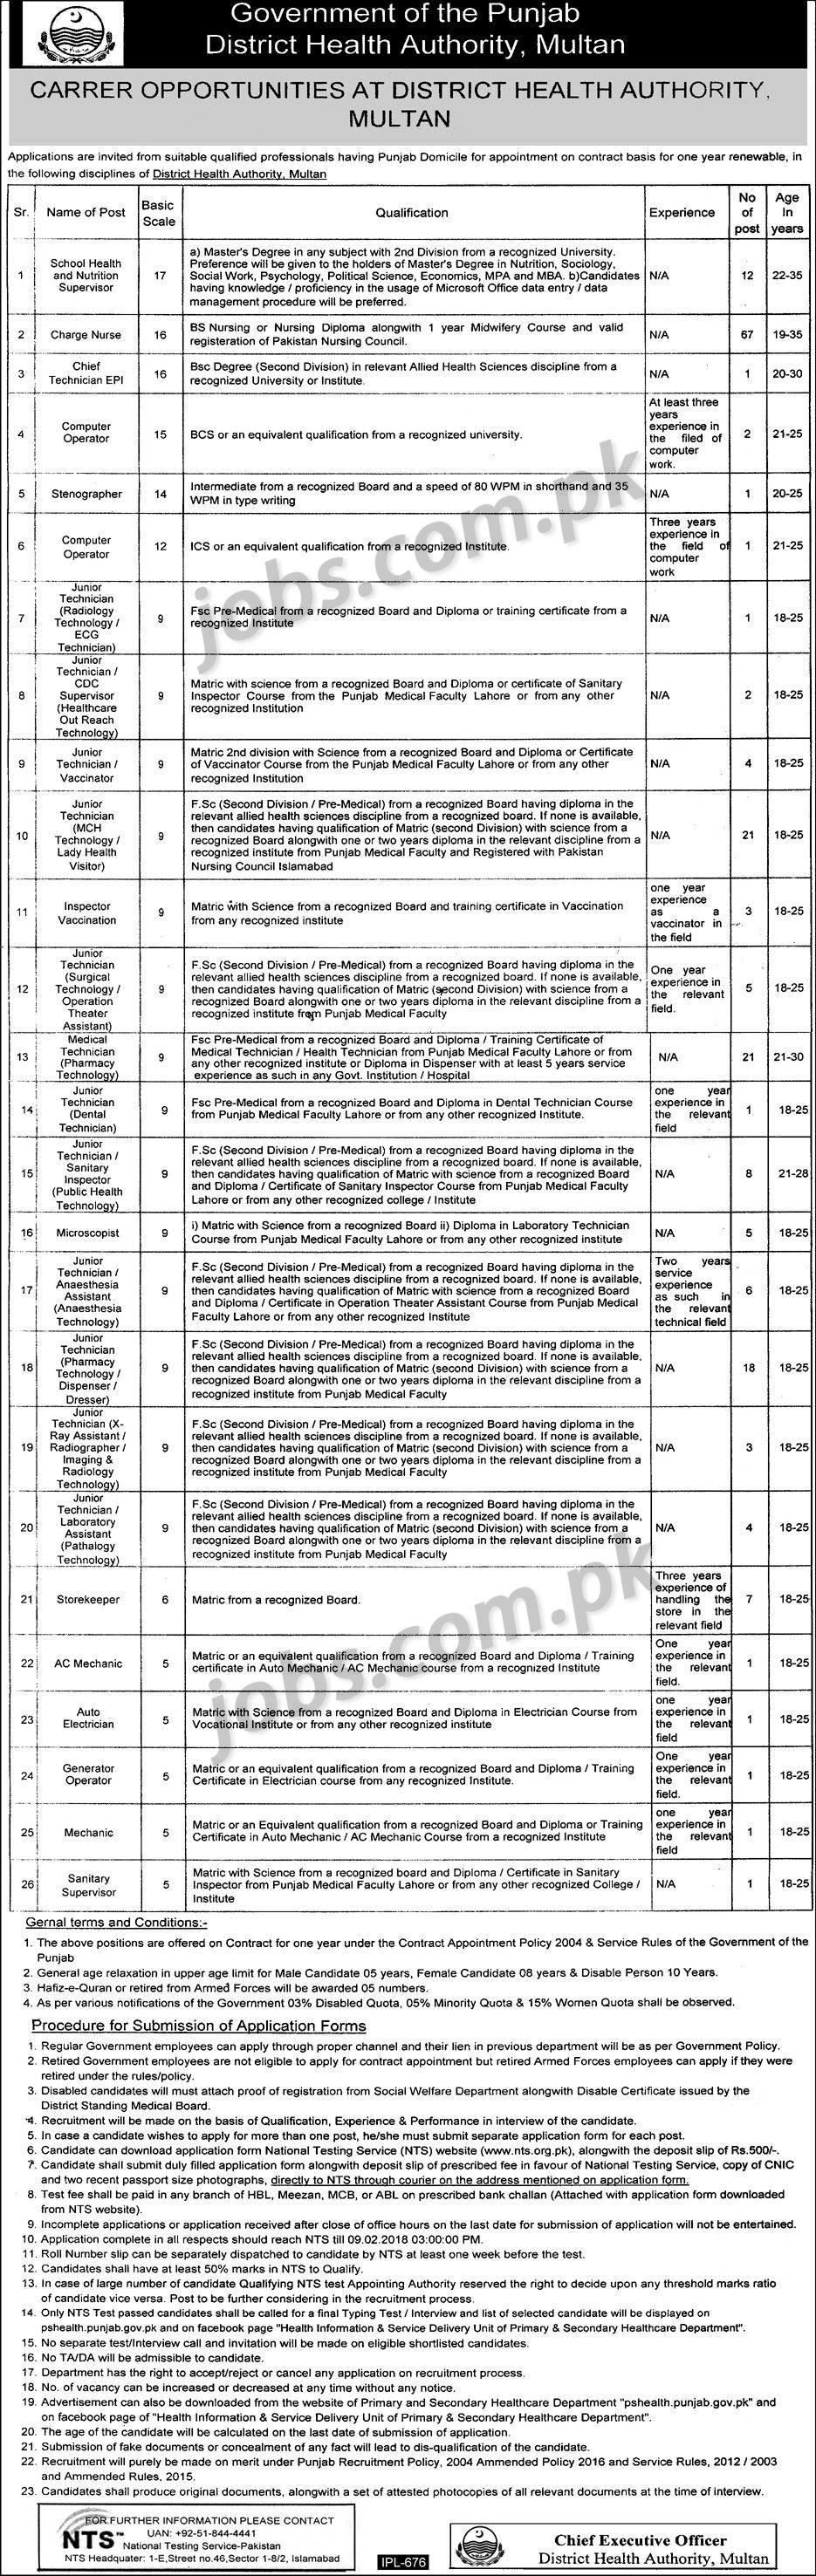 District Health Authority Multan Jobs